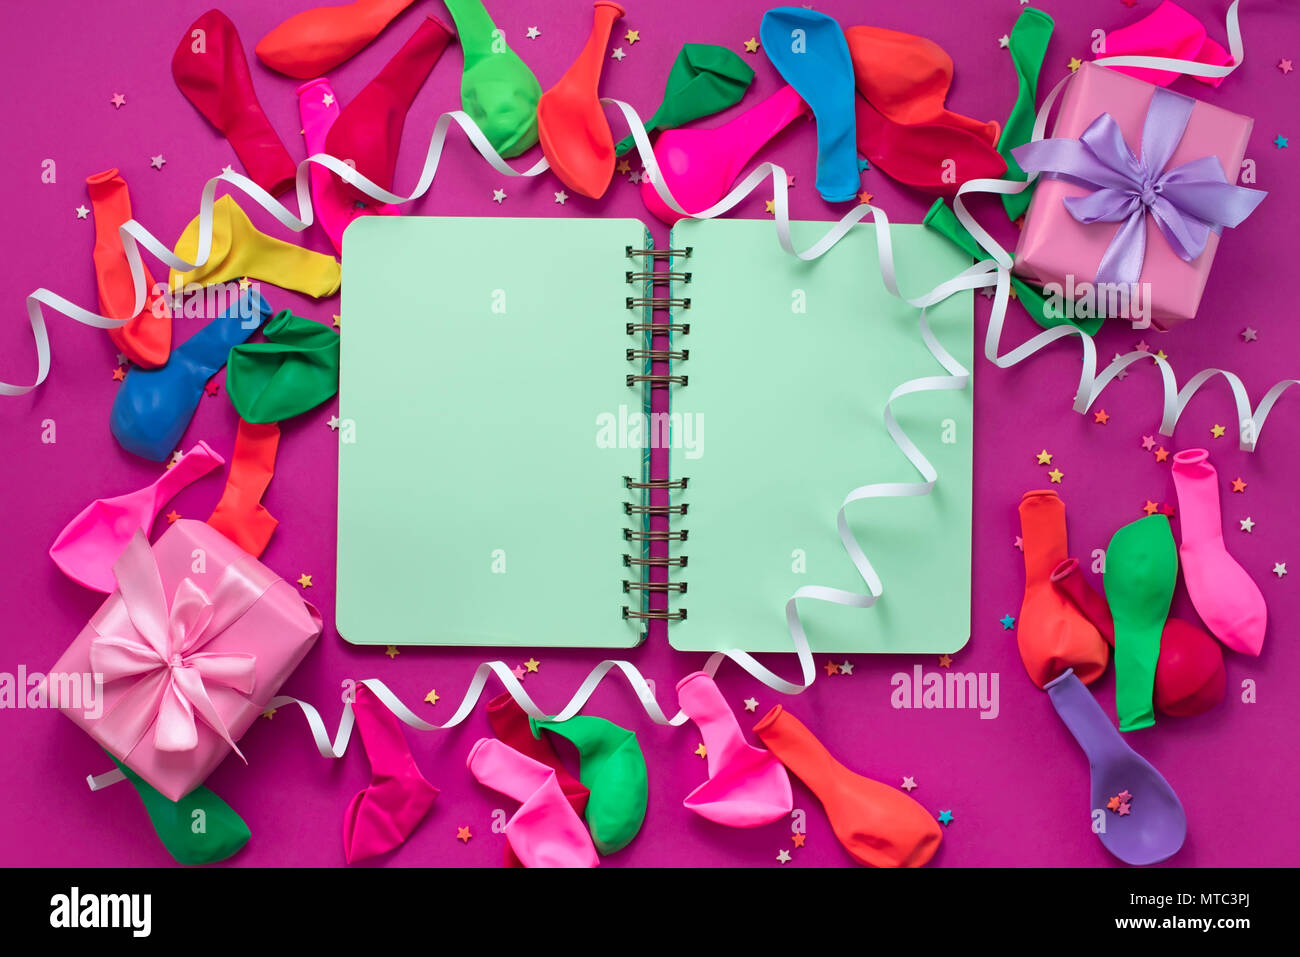 Banner Festive Background Decorative Composition Materials